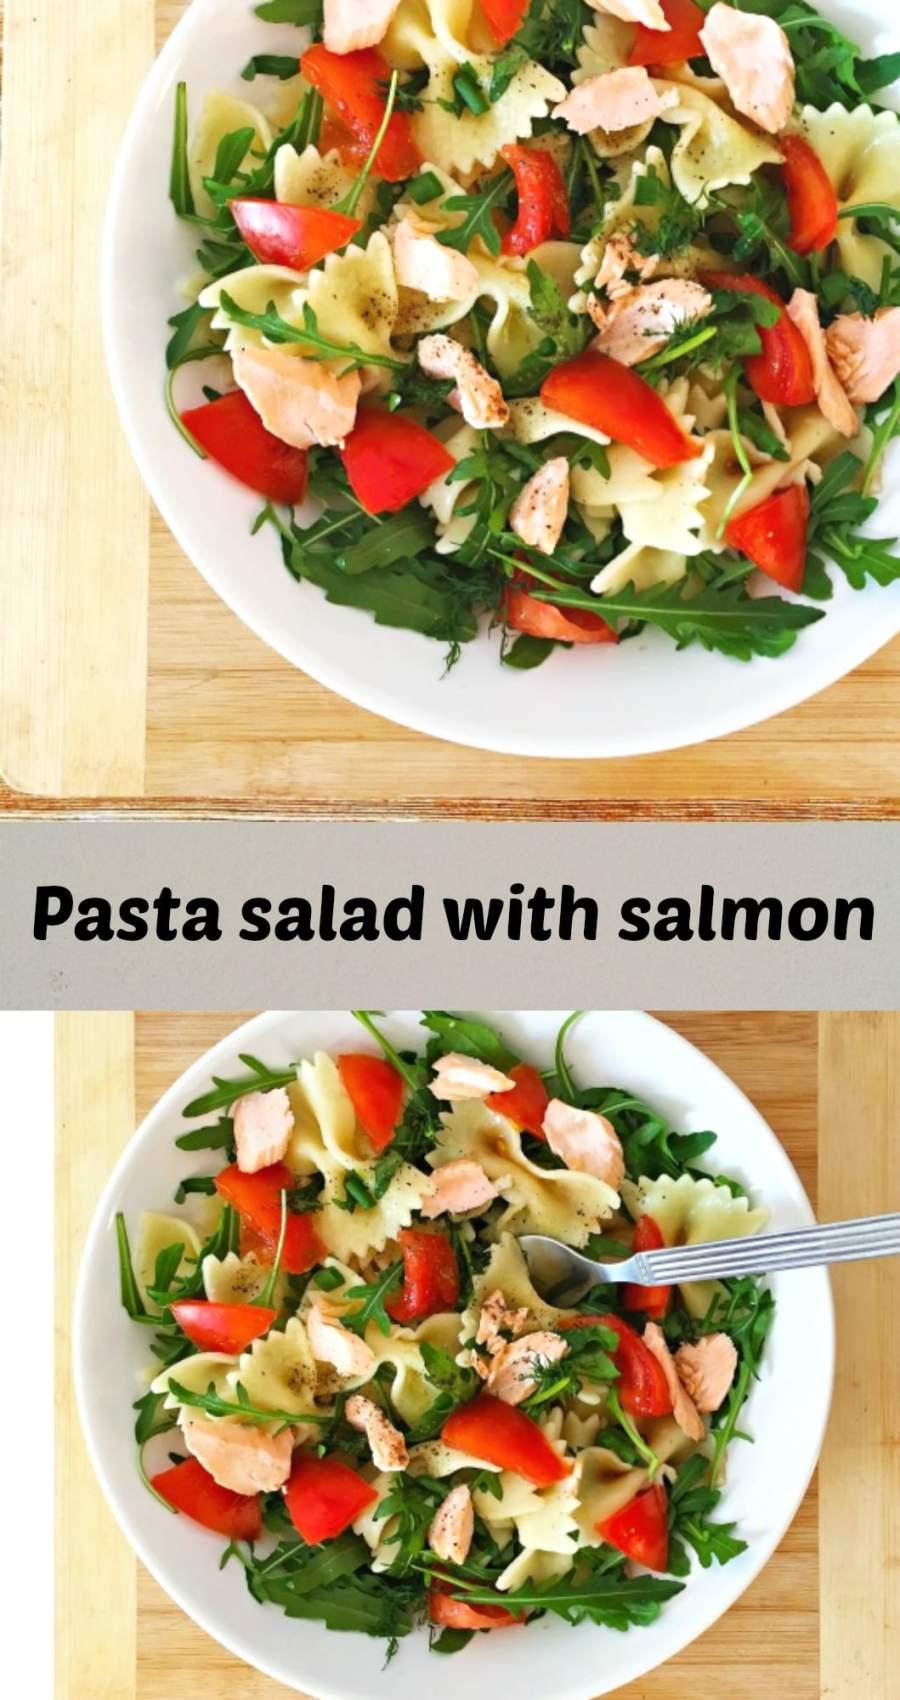 Pasta salad with salmon